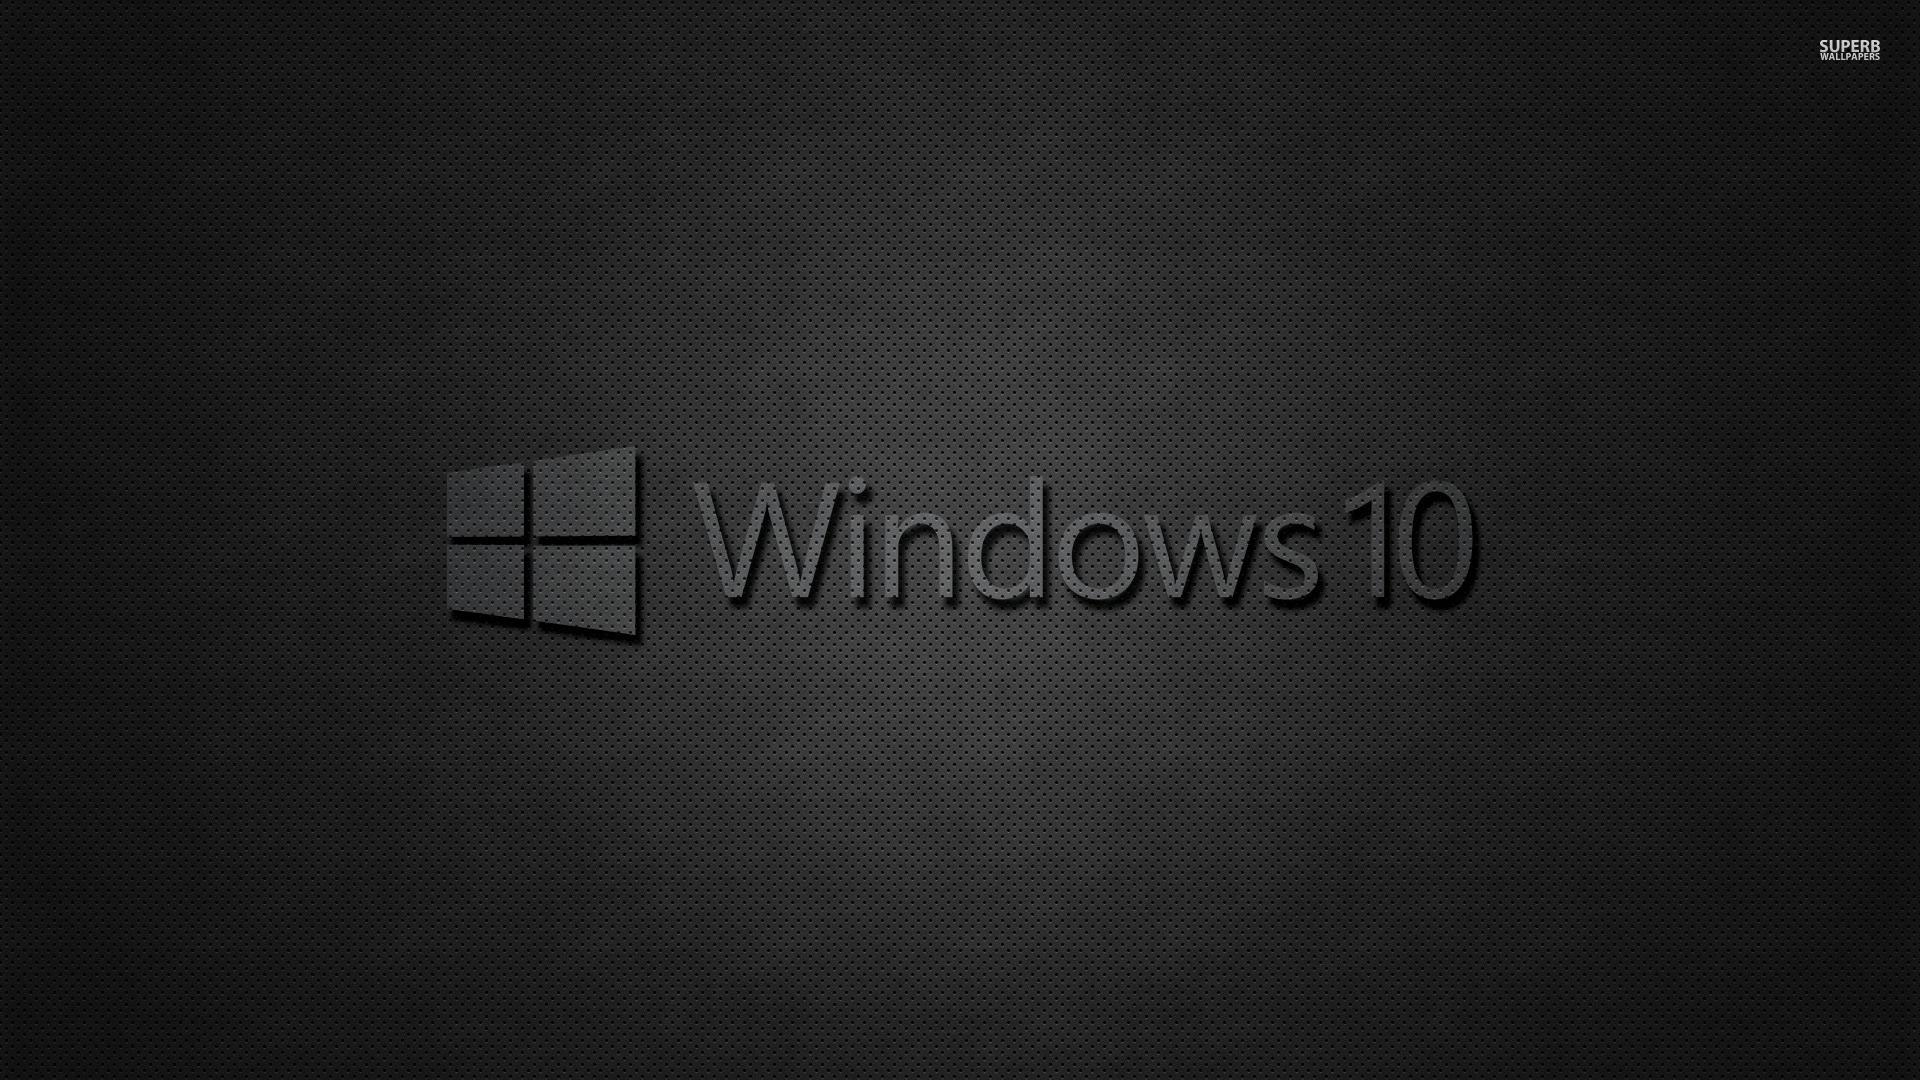 Windows 10 1080P Wallpapers